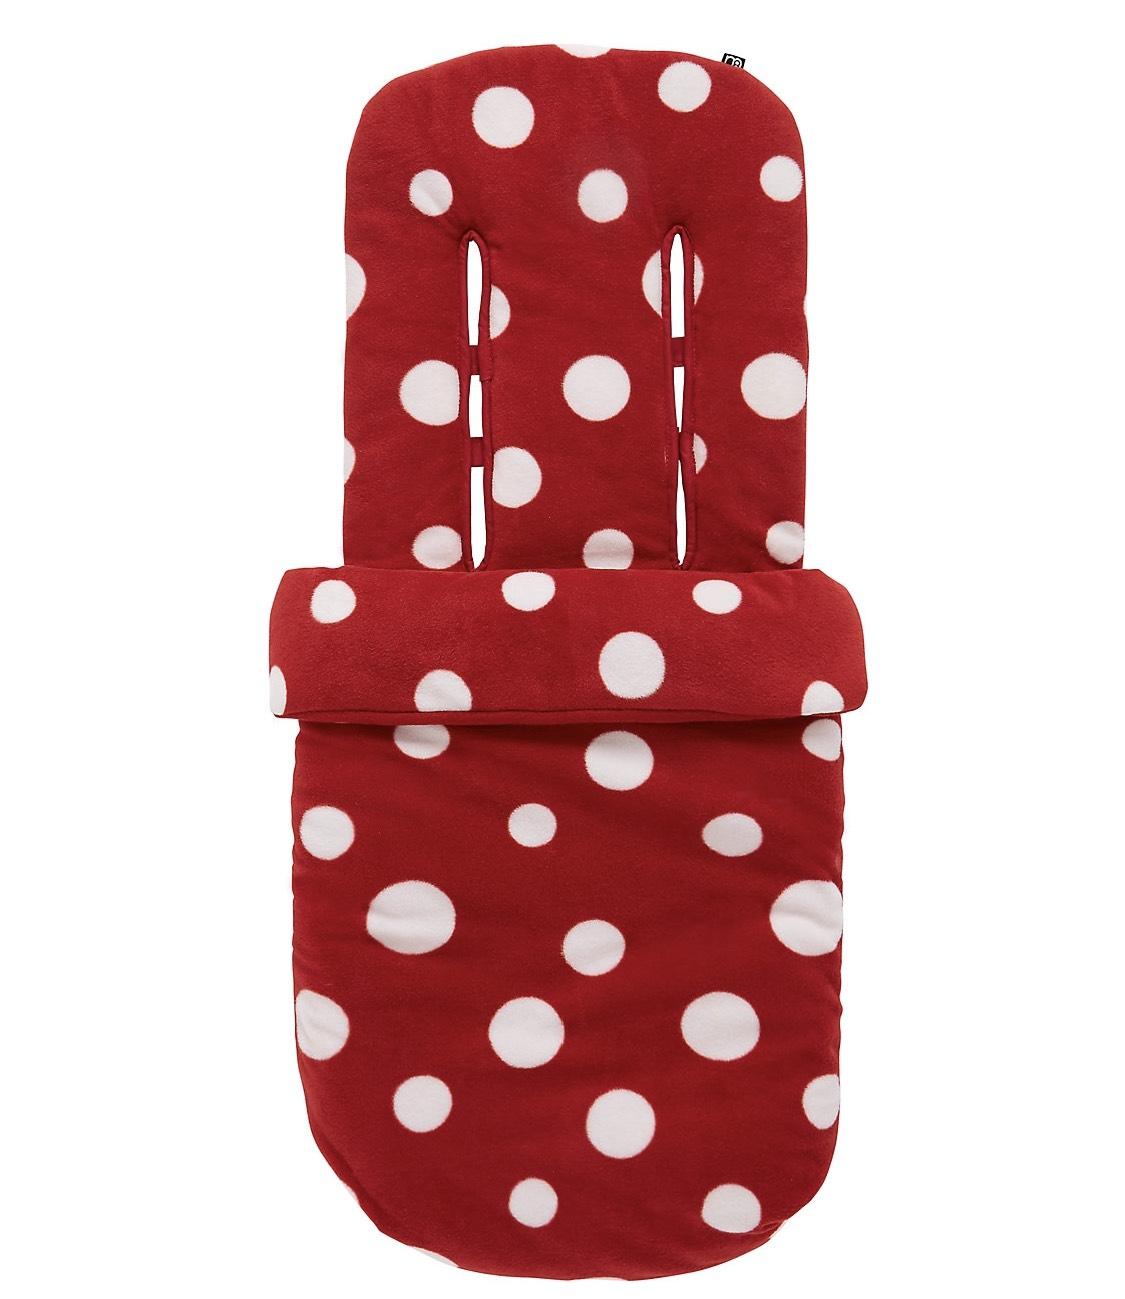 Mothercare Fleece Cosytoe - Red Spot £12 free c+c @ Mothercare